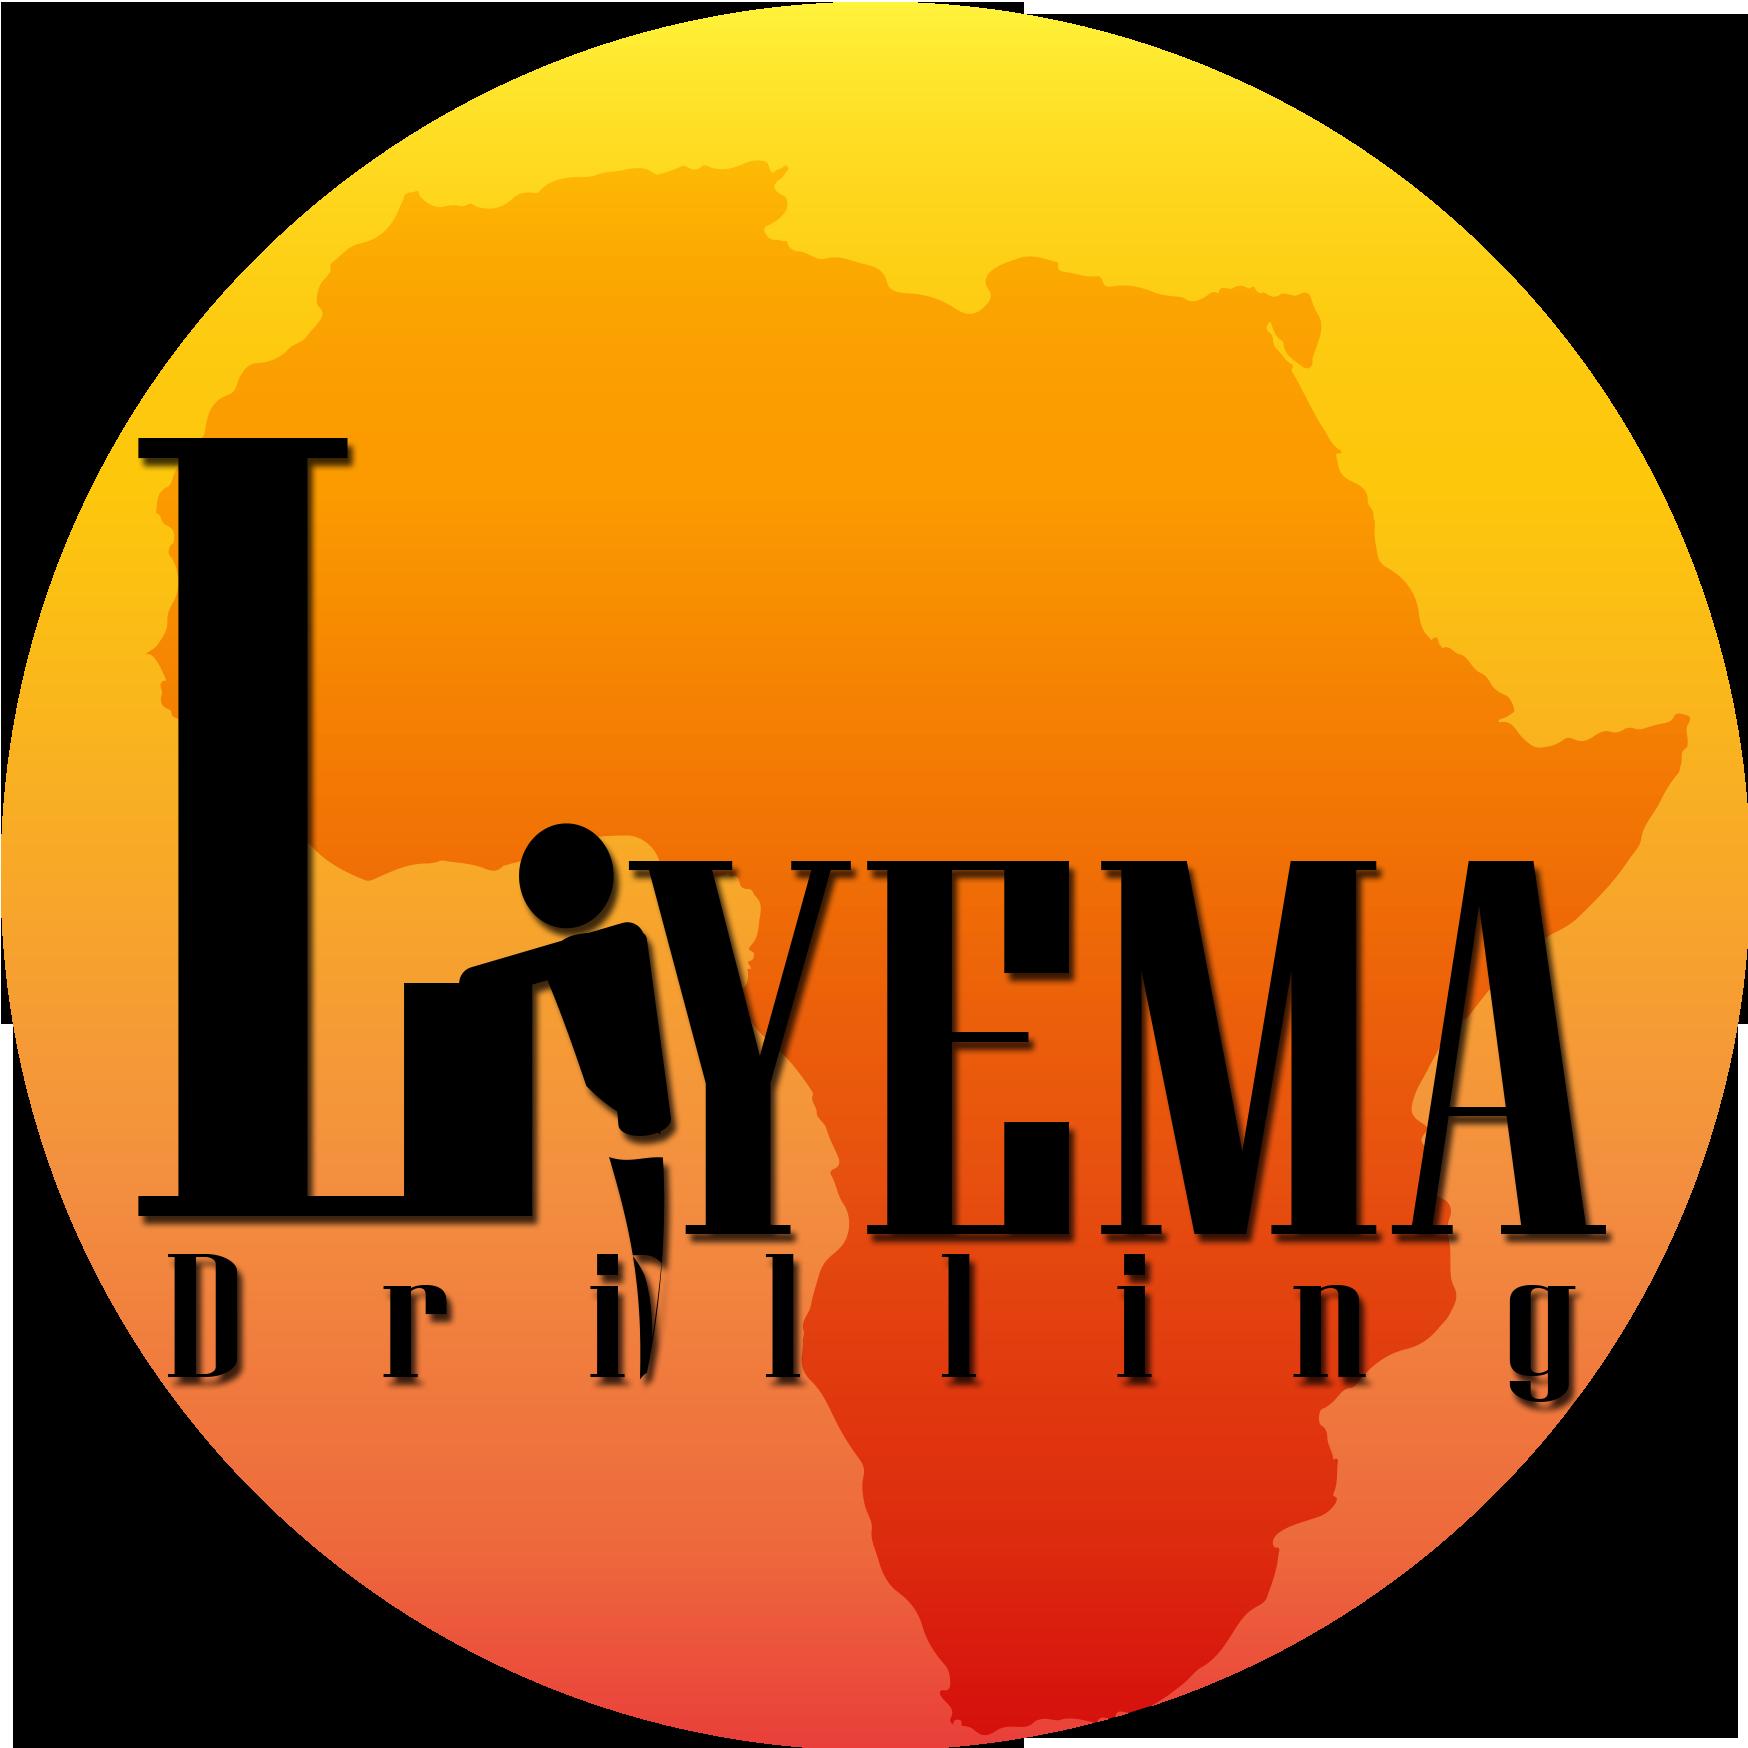 LIYEMA-LOGO1 (1).png